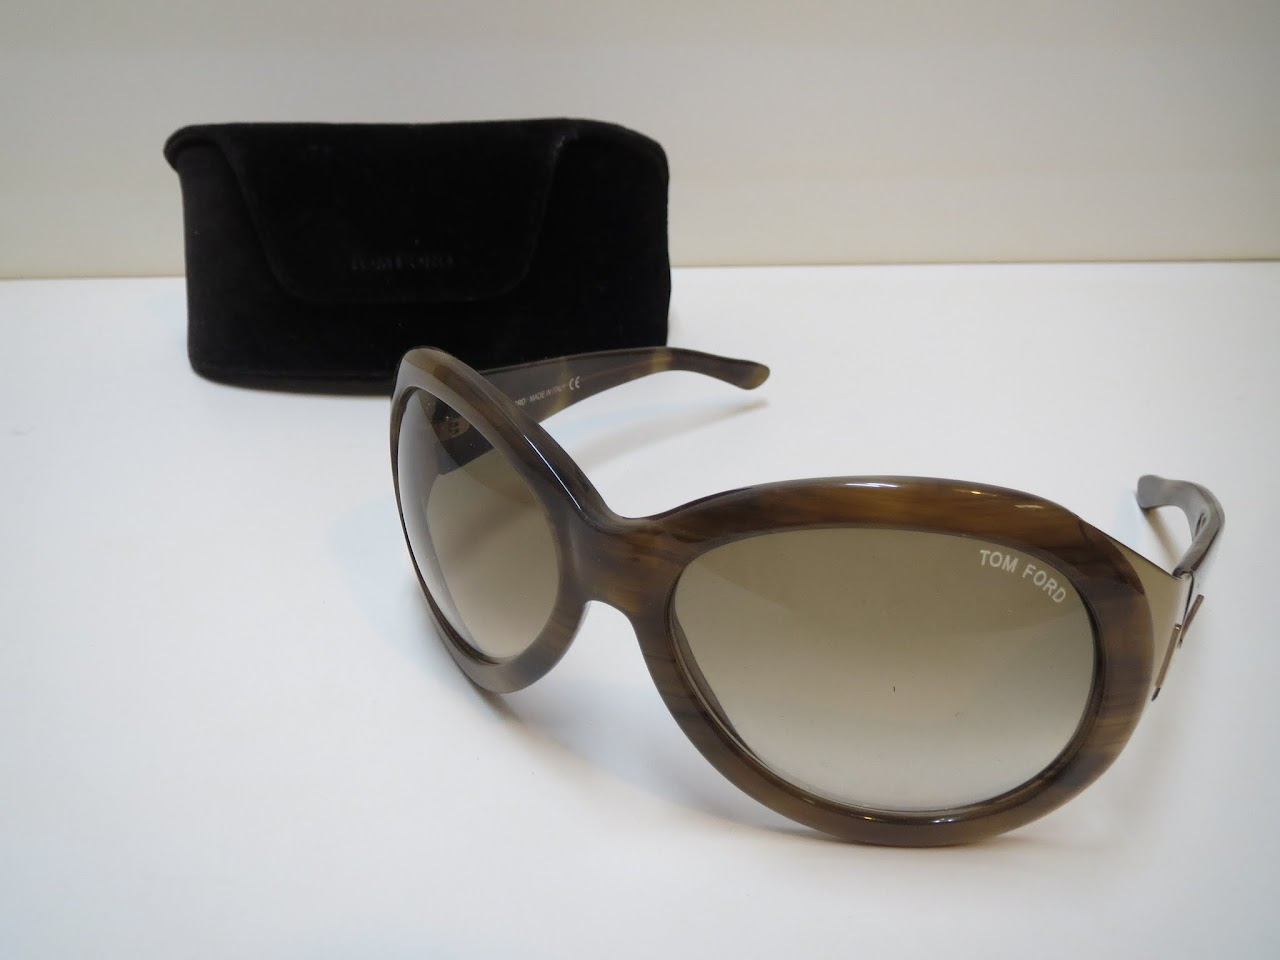 Tom Ford Elisabeth Sunglasses